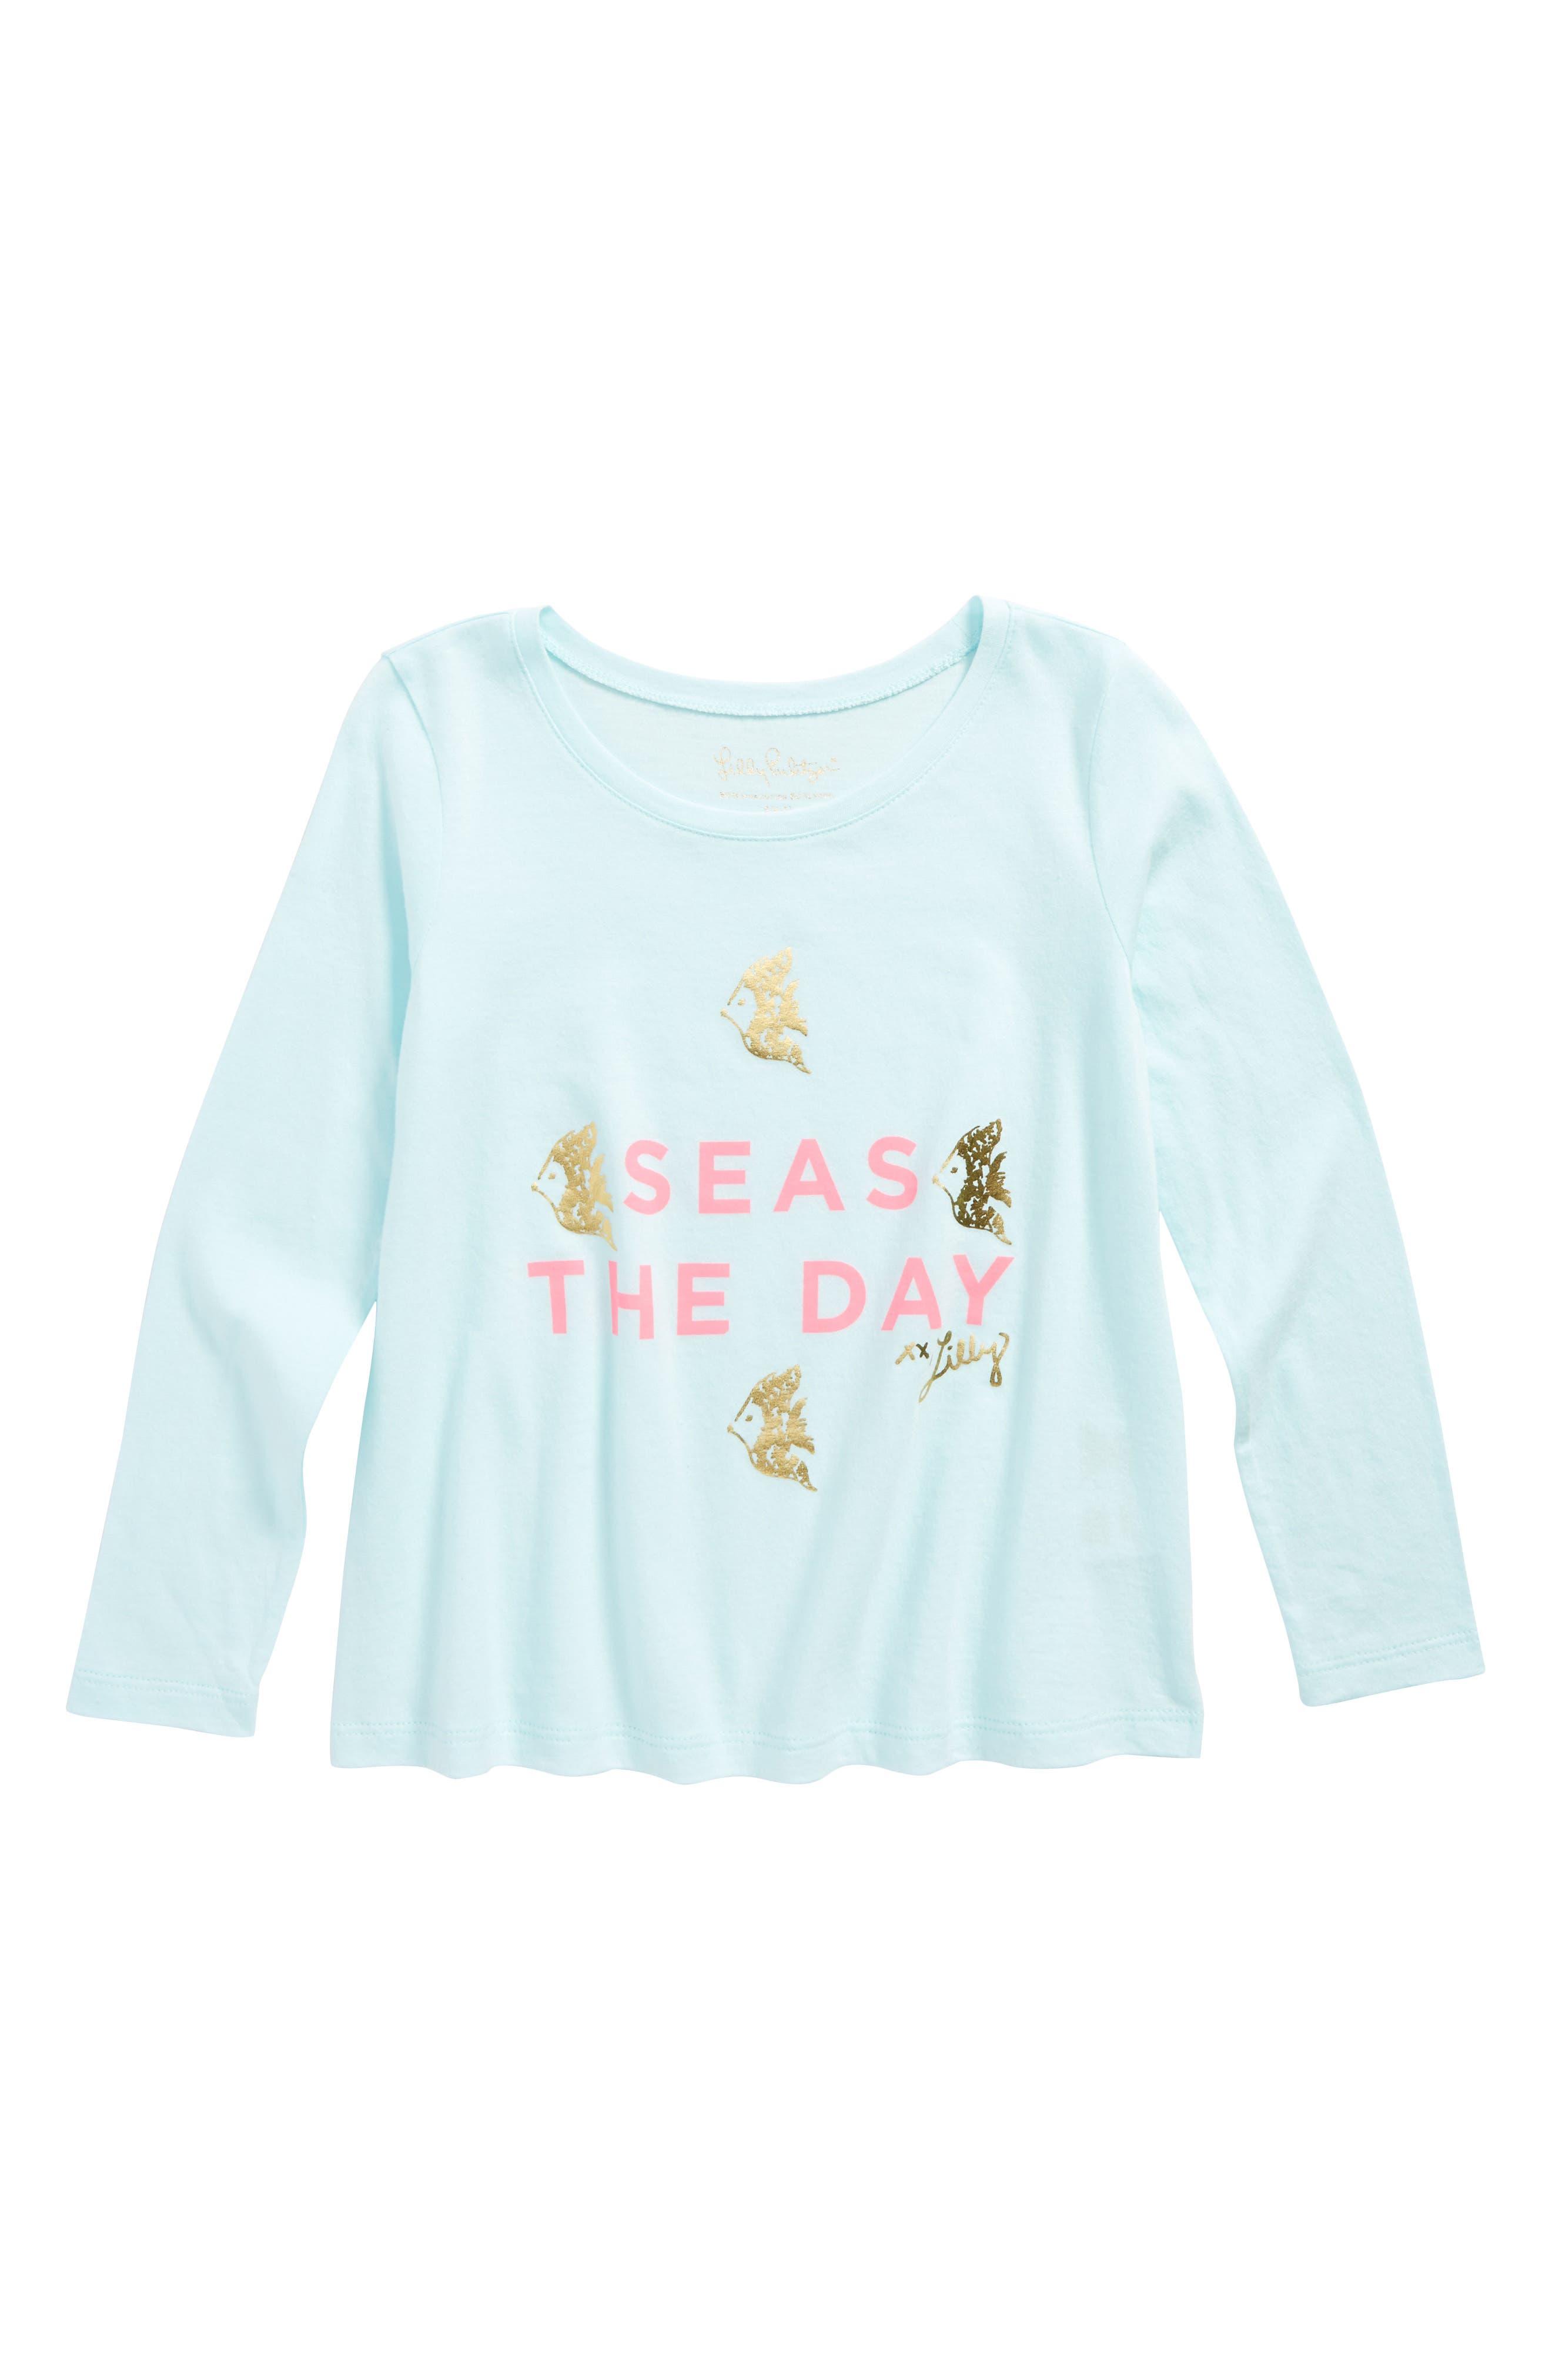 Main Image - Lilly Pulitzer® Kay Graphic Tee (Toddler Girls, Little Girls & Big Girls)